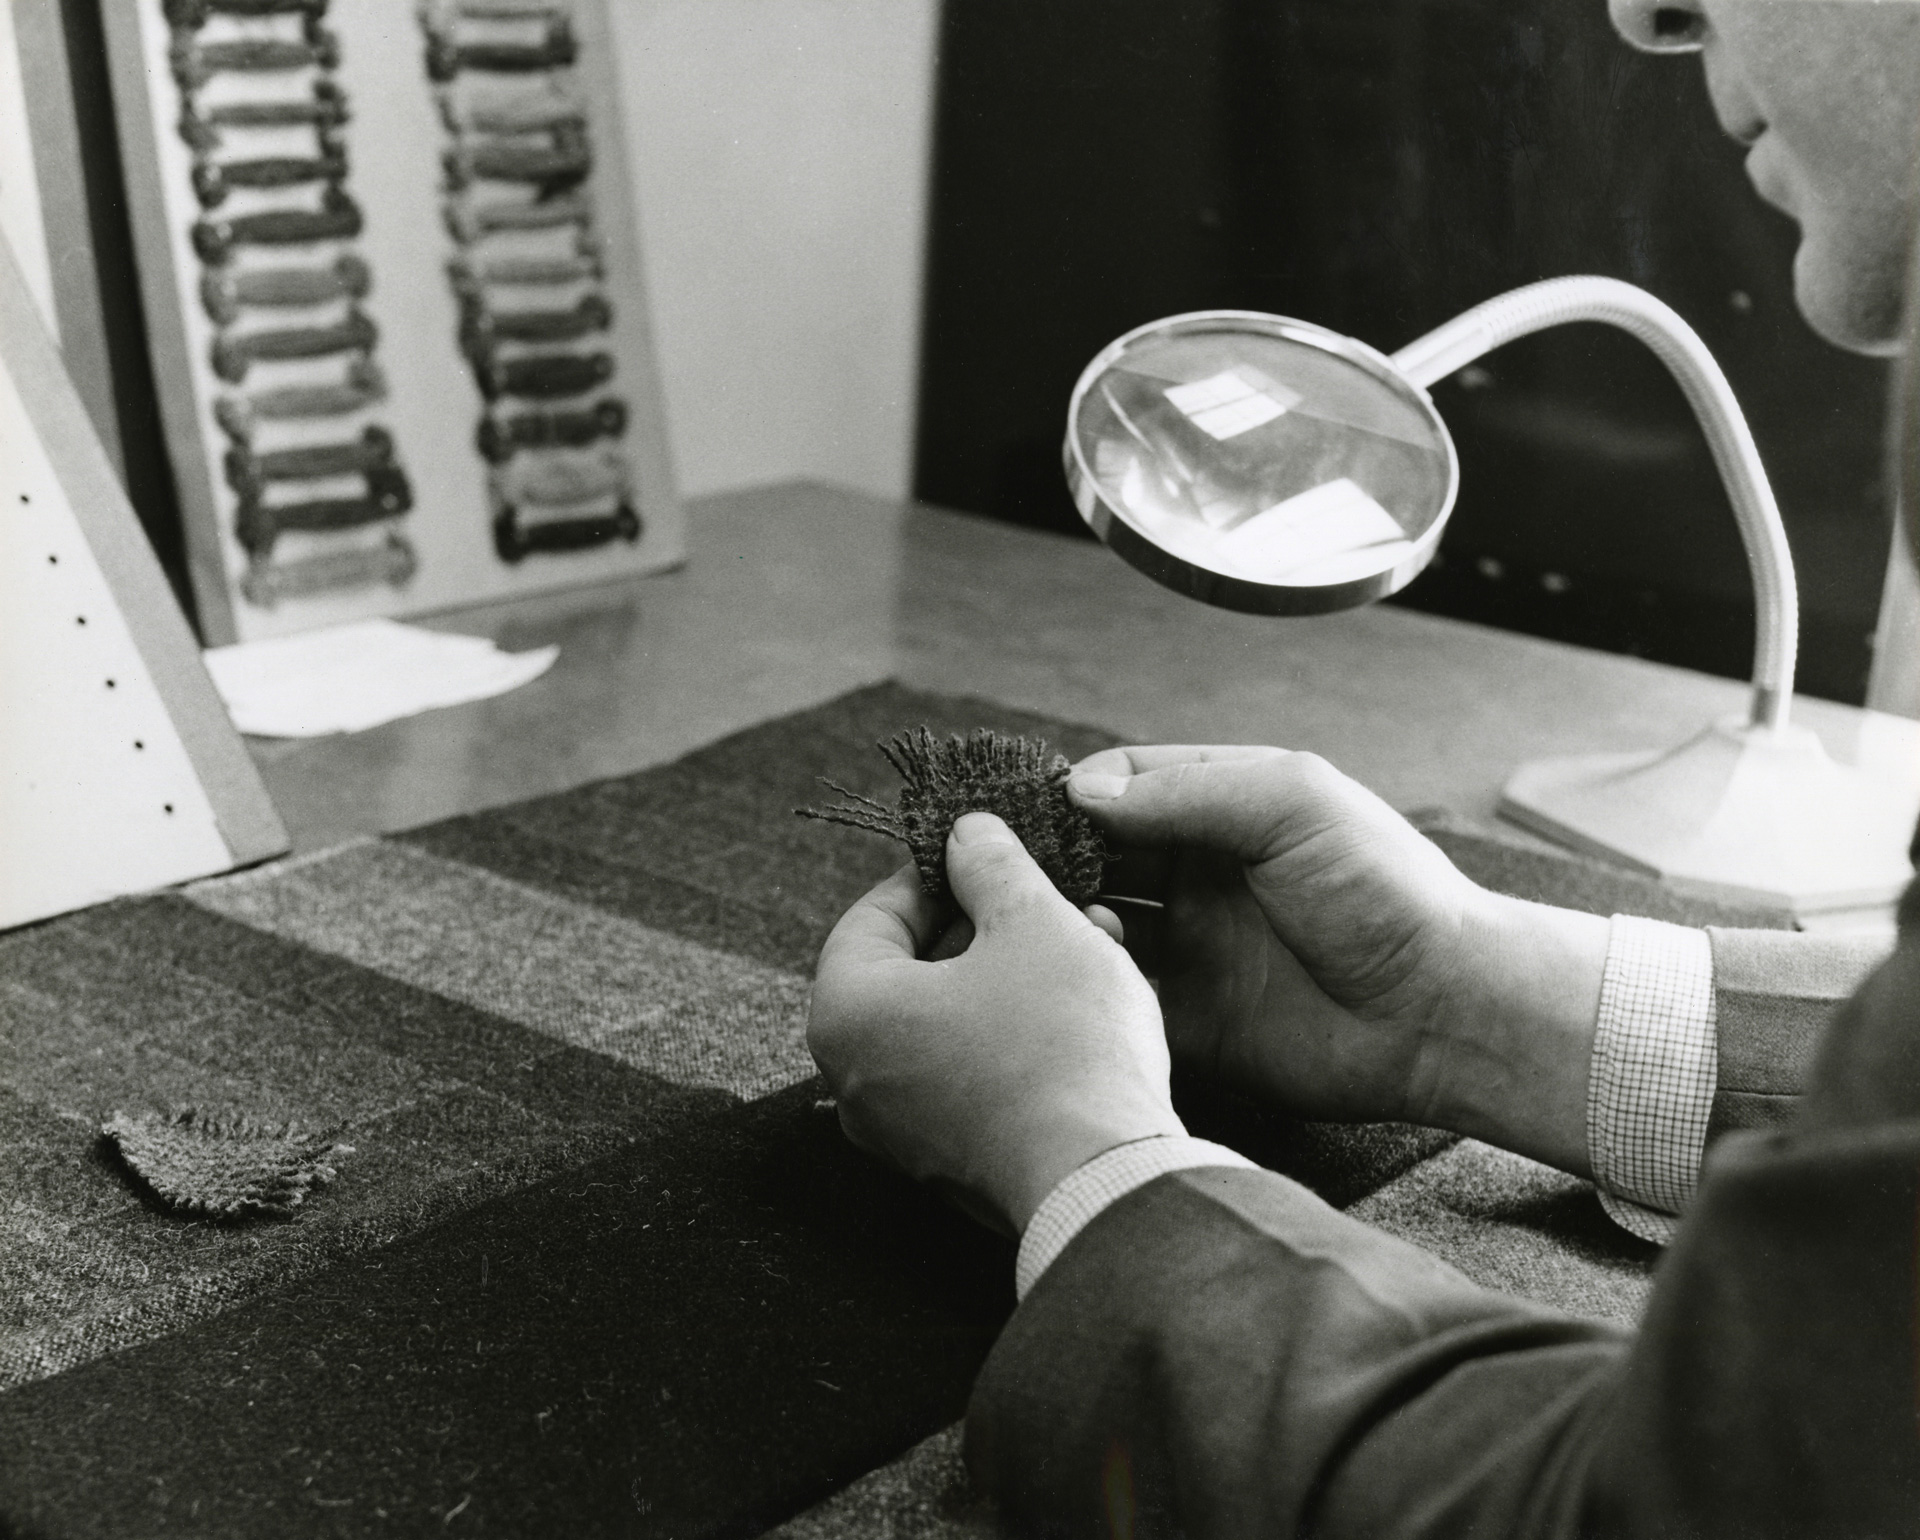 harris tweed authority archive inspection